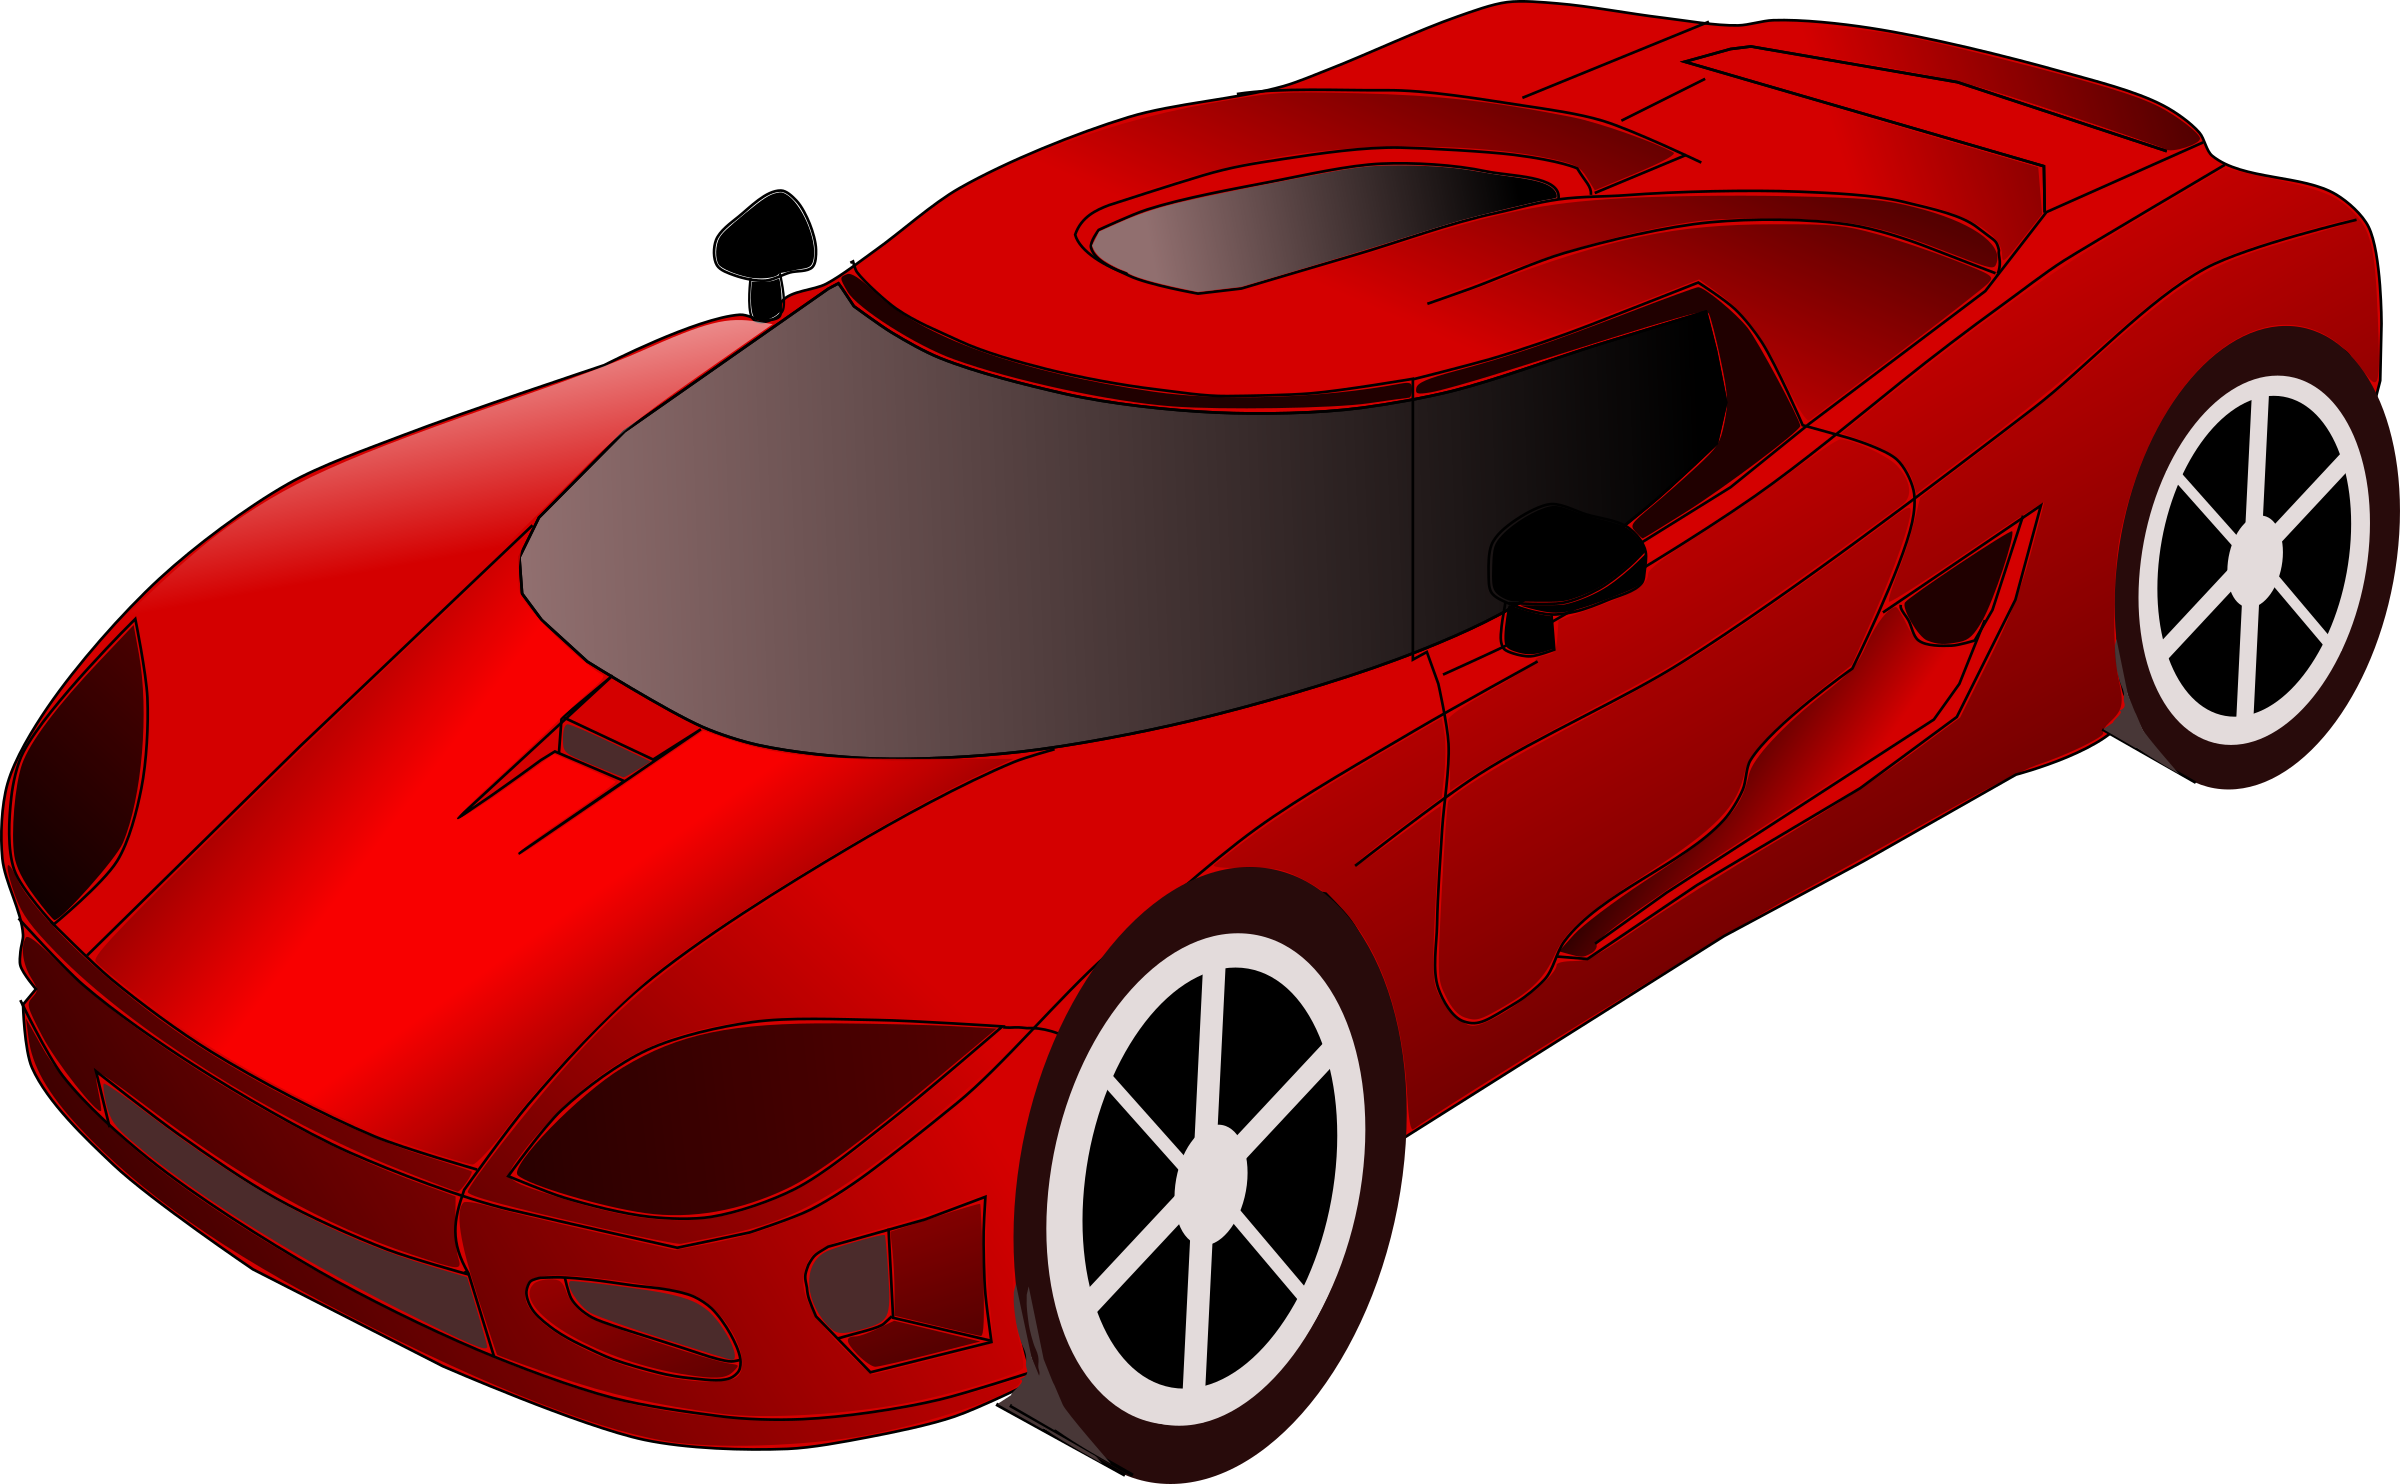 Car Top View Drawing